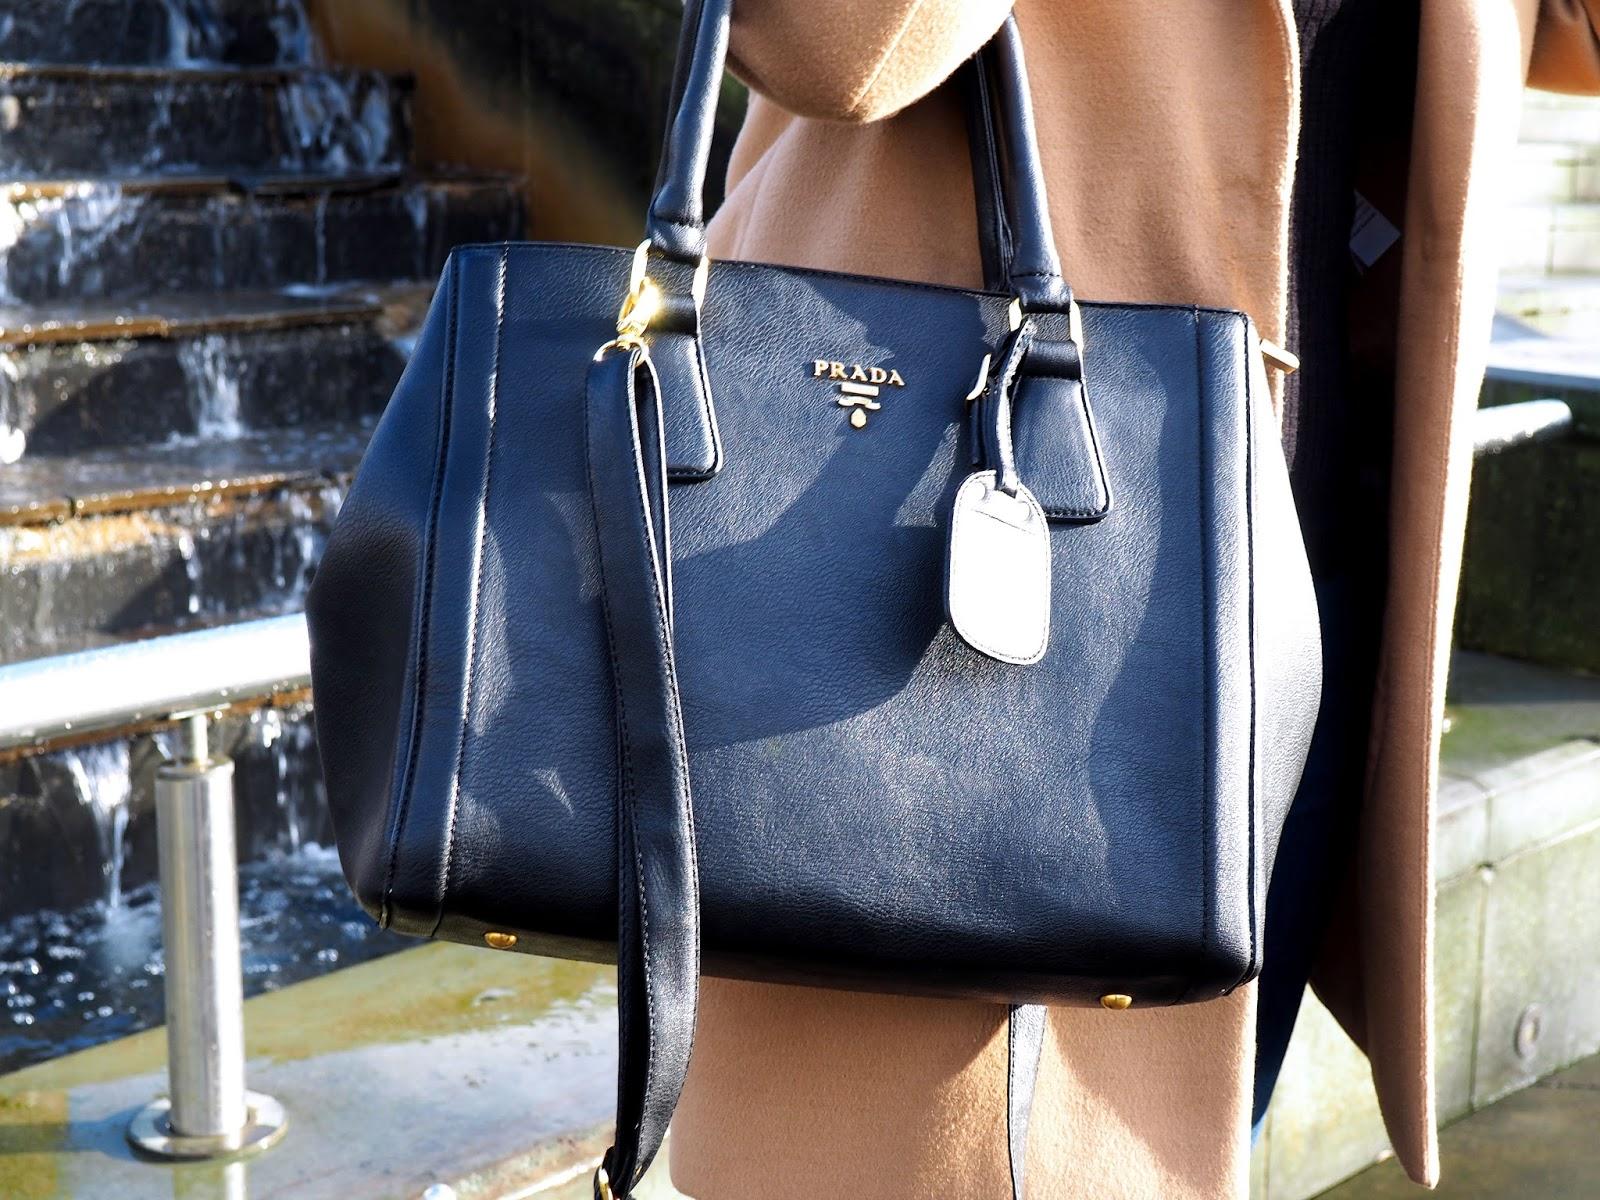 Black Prada Handbag with Gold Hardware